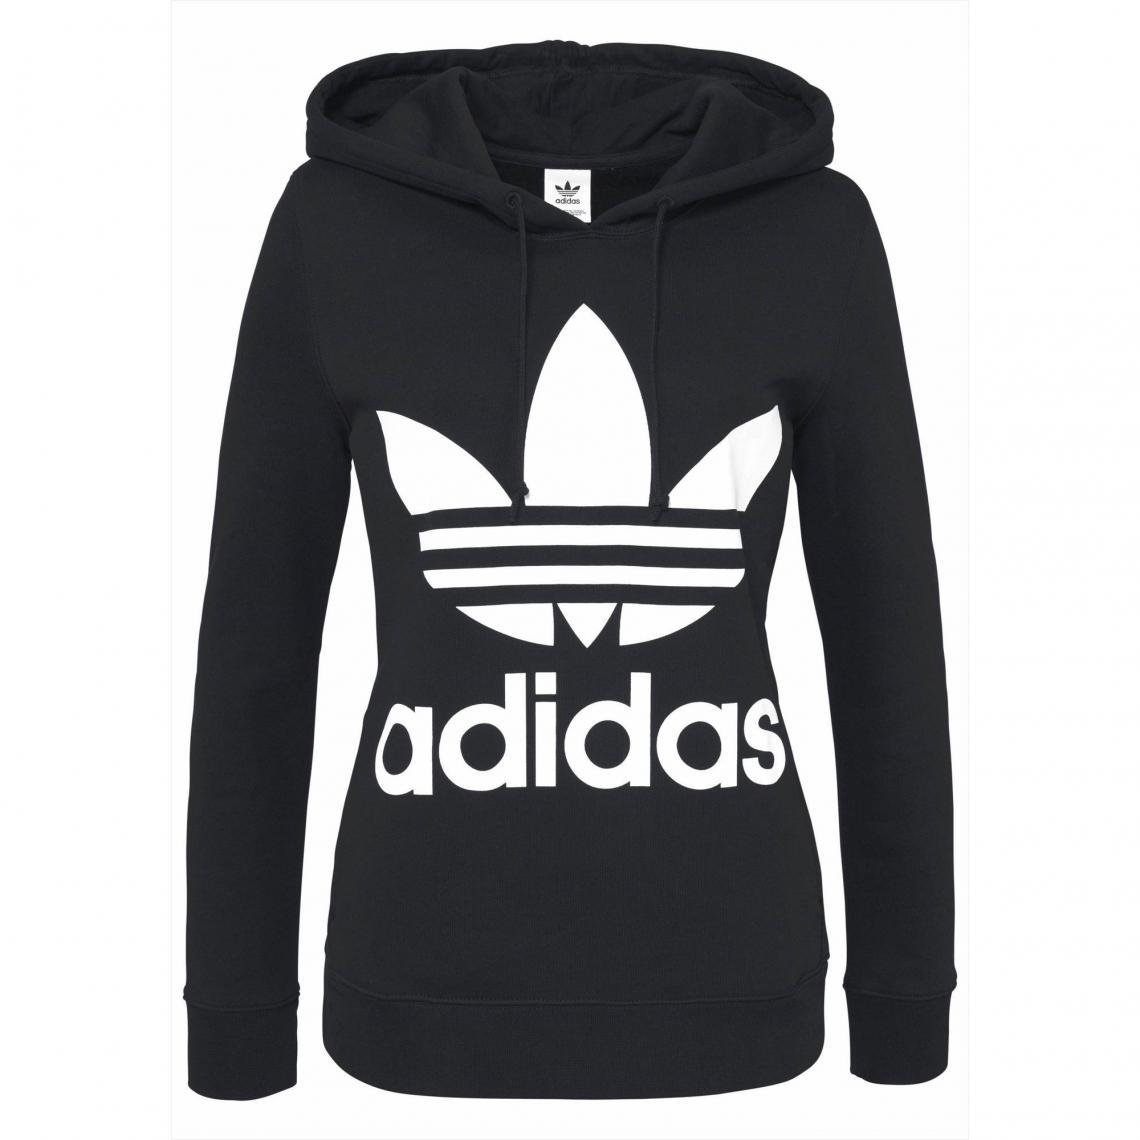 2affdd22a5bdb Sweat enfilable à capuche femme adidas Originals - Noir Adidas Originals